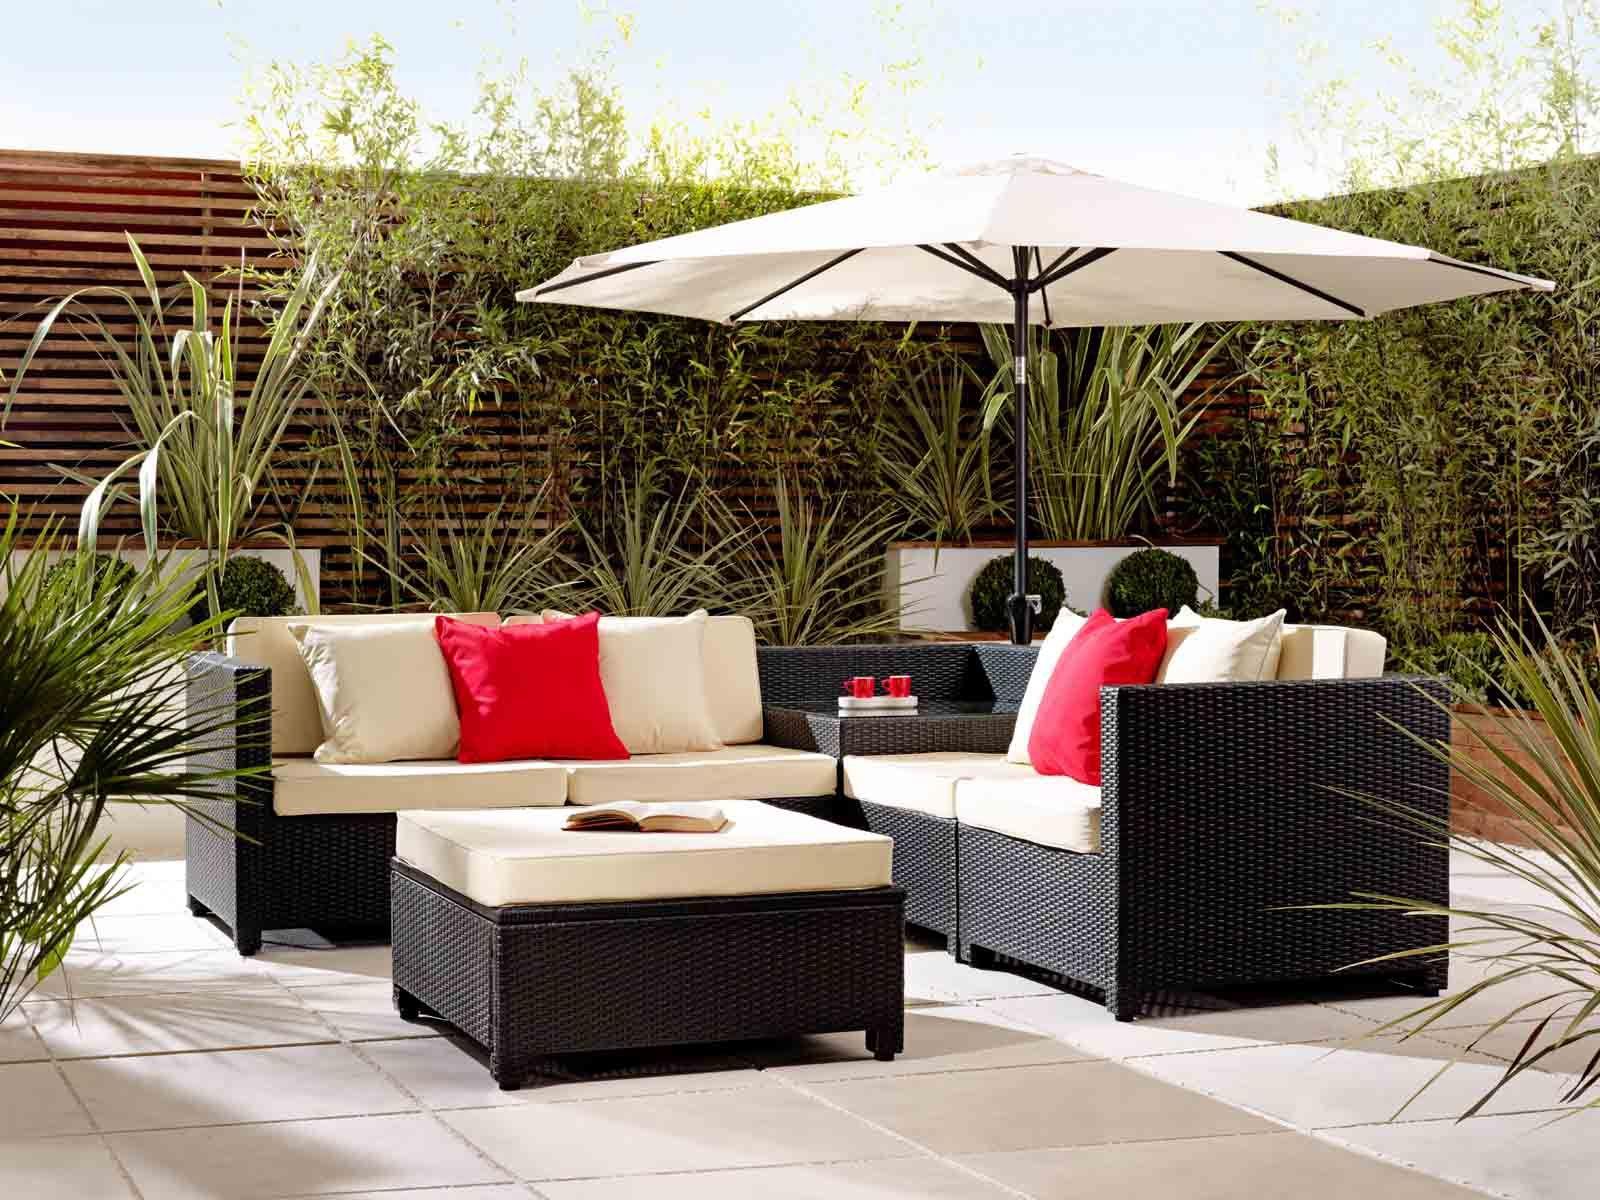 Rattan Outdoor Sofa Set with Corner Table Garden Furniture in Black ...